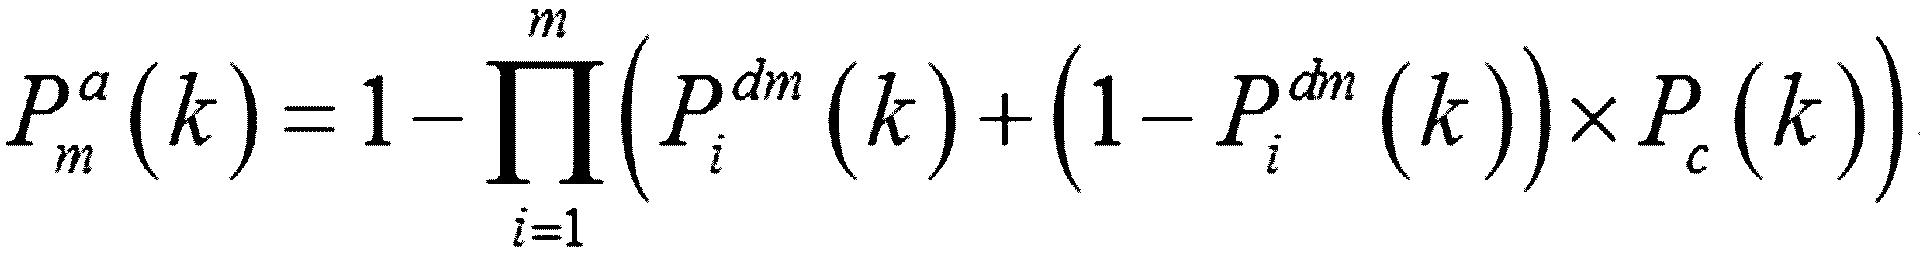 Figure PCTKR2017003696-appb-I000004